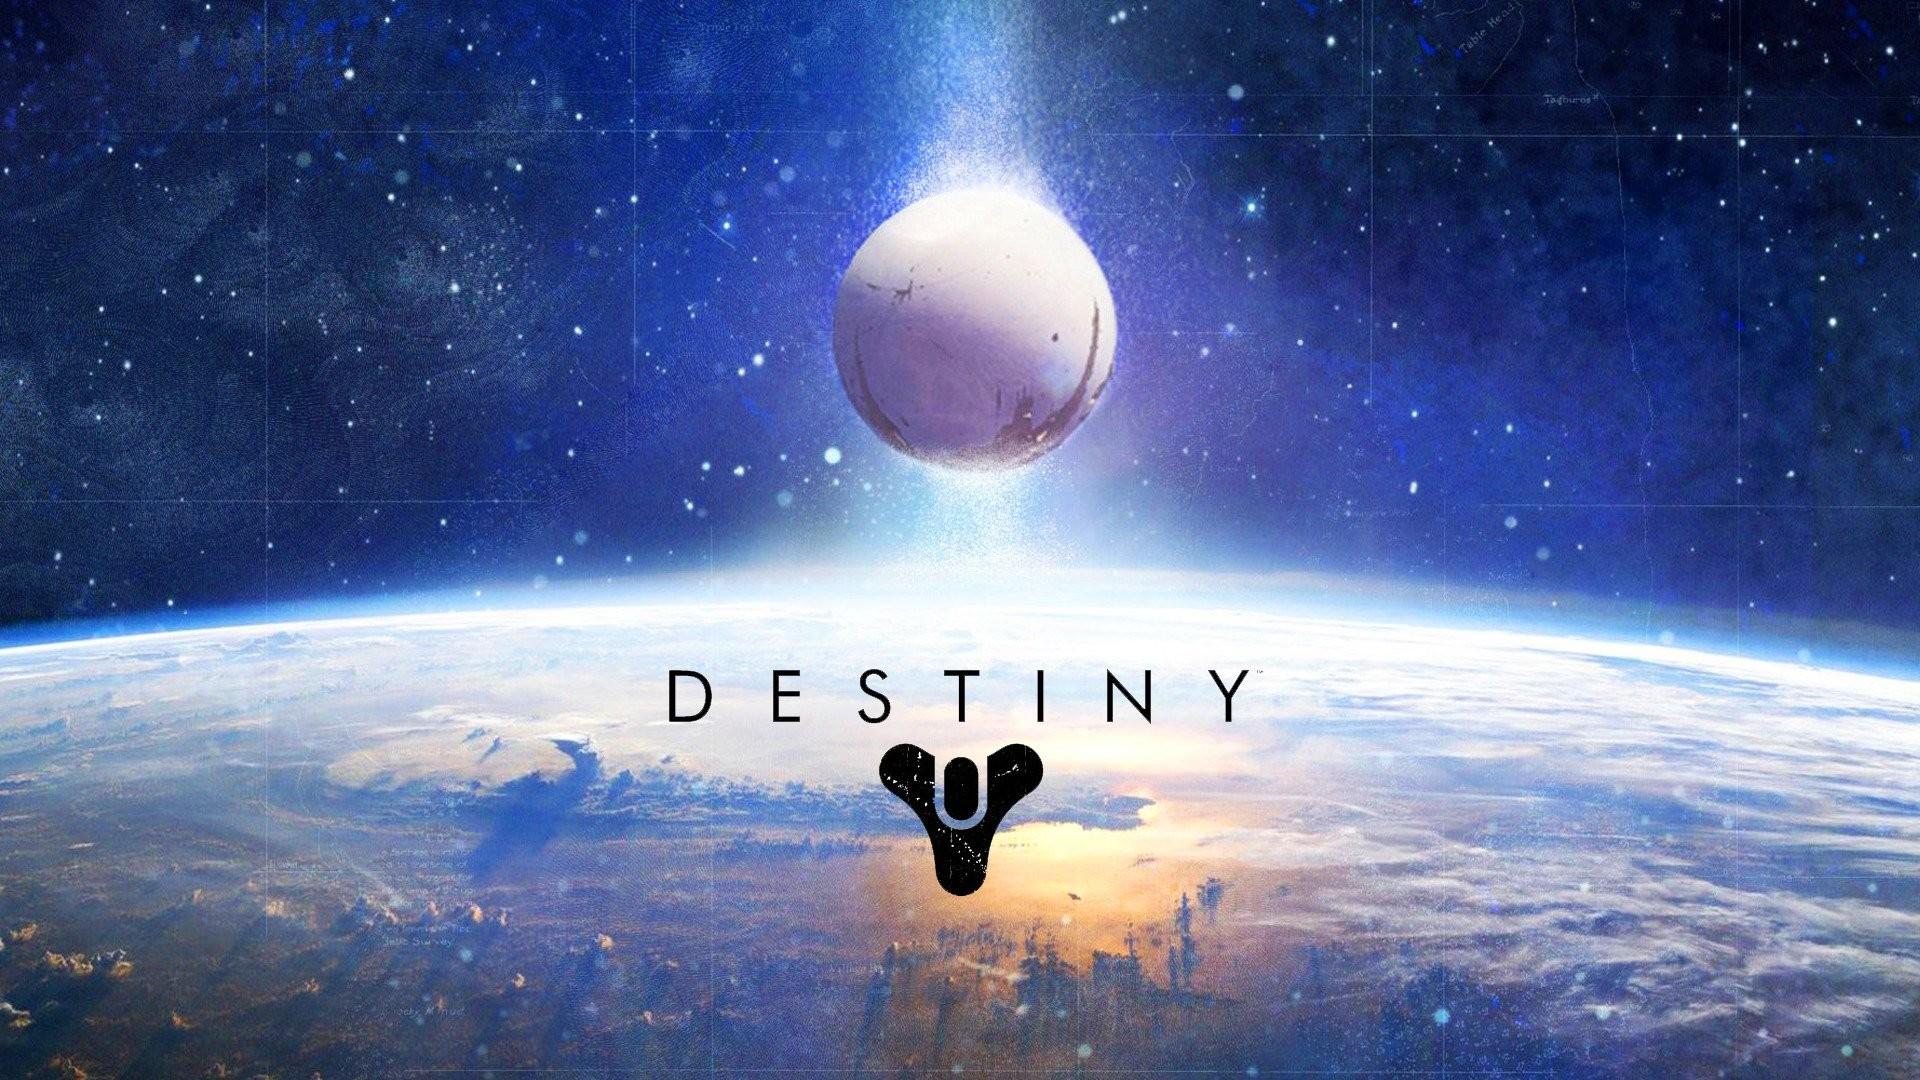 Destiny 2 Wallpaper 1080p: Destiny Wallpaper 1080p (85+ Images